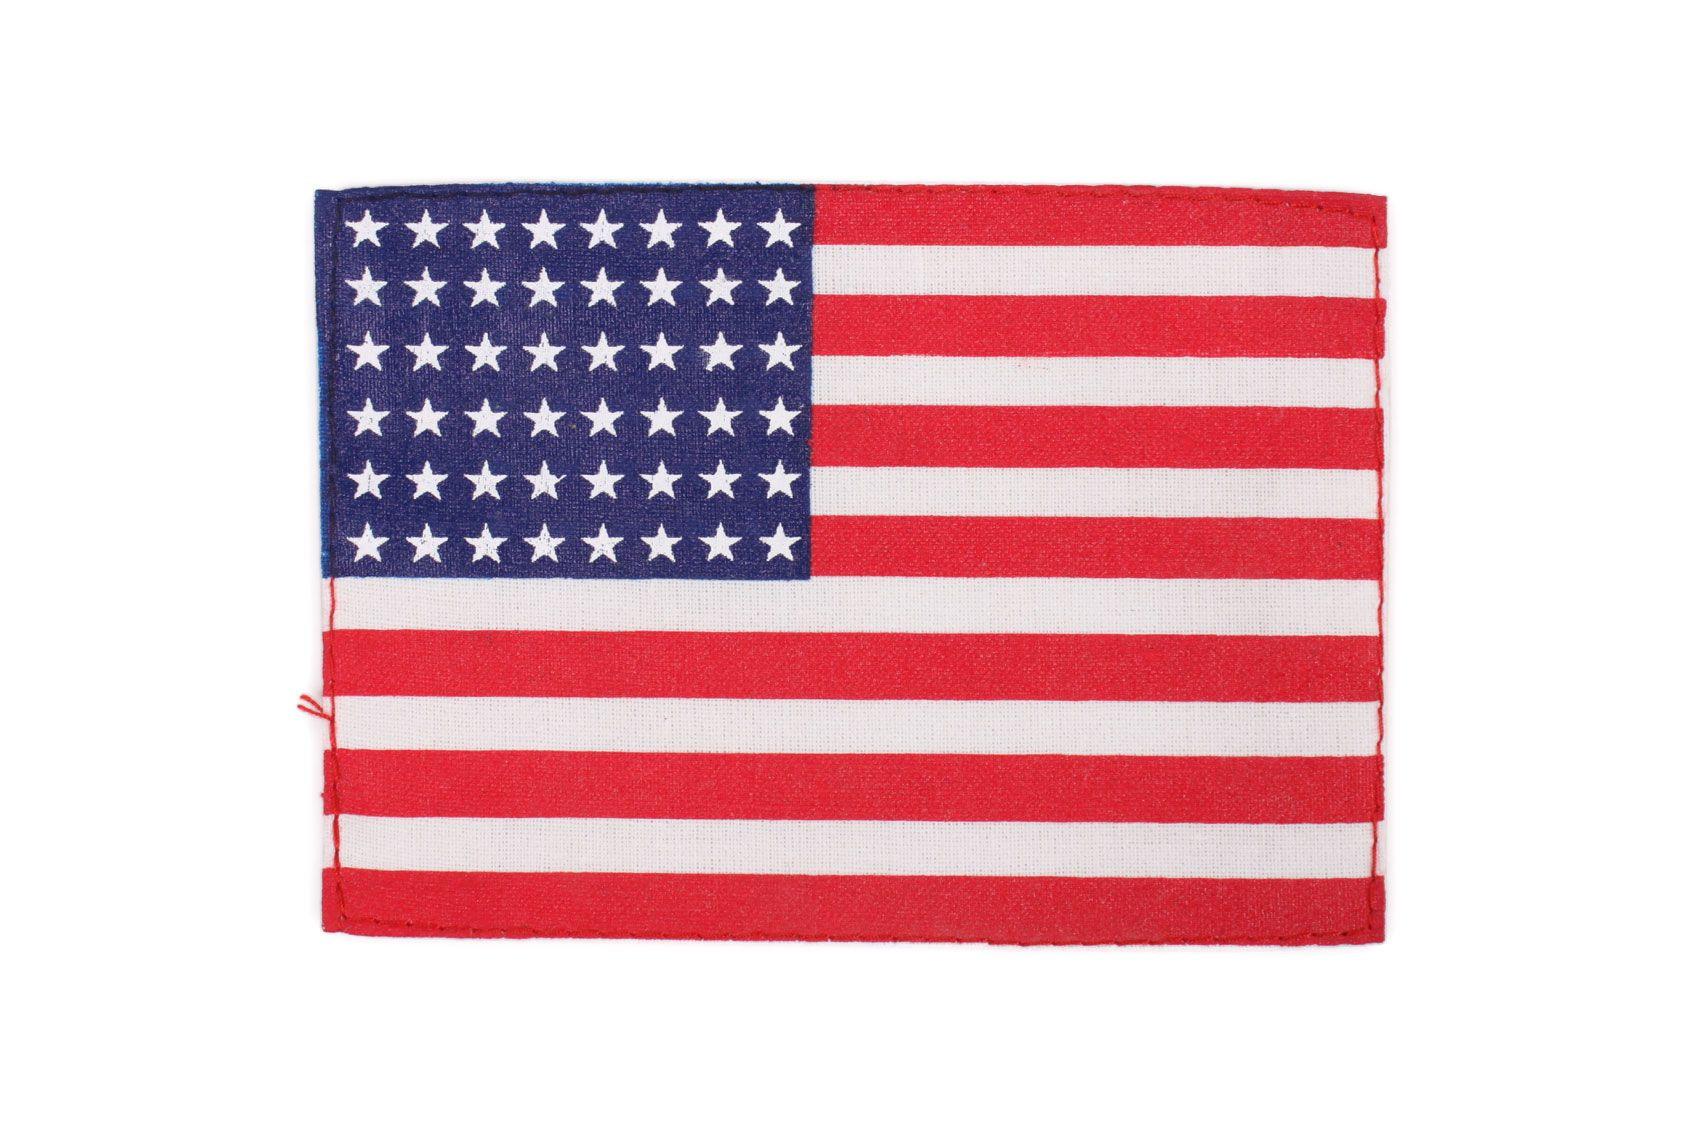 Patch, U.S. Flag (48 stars) - 12 cm x 8 cm